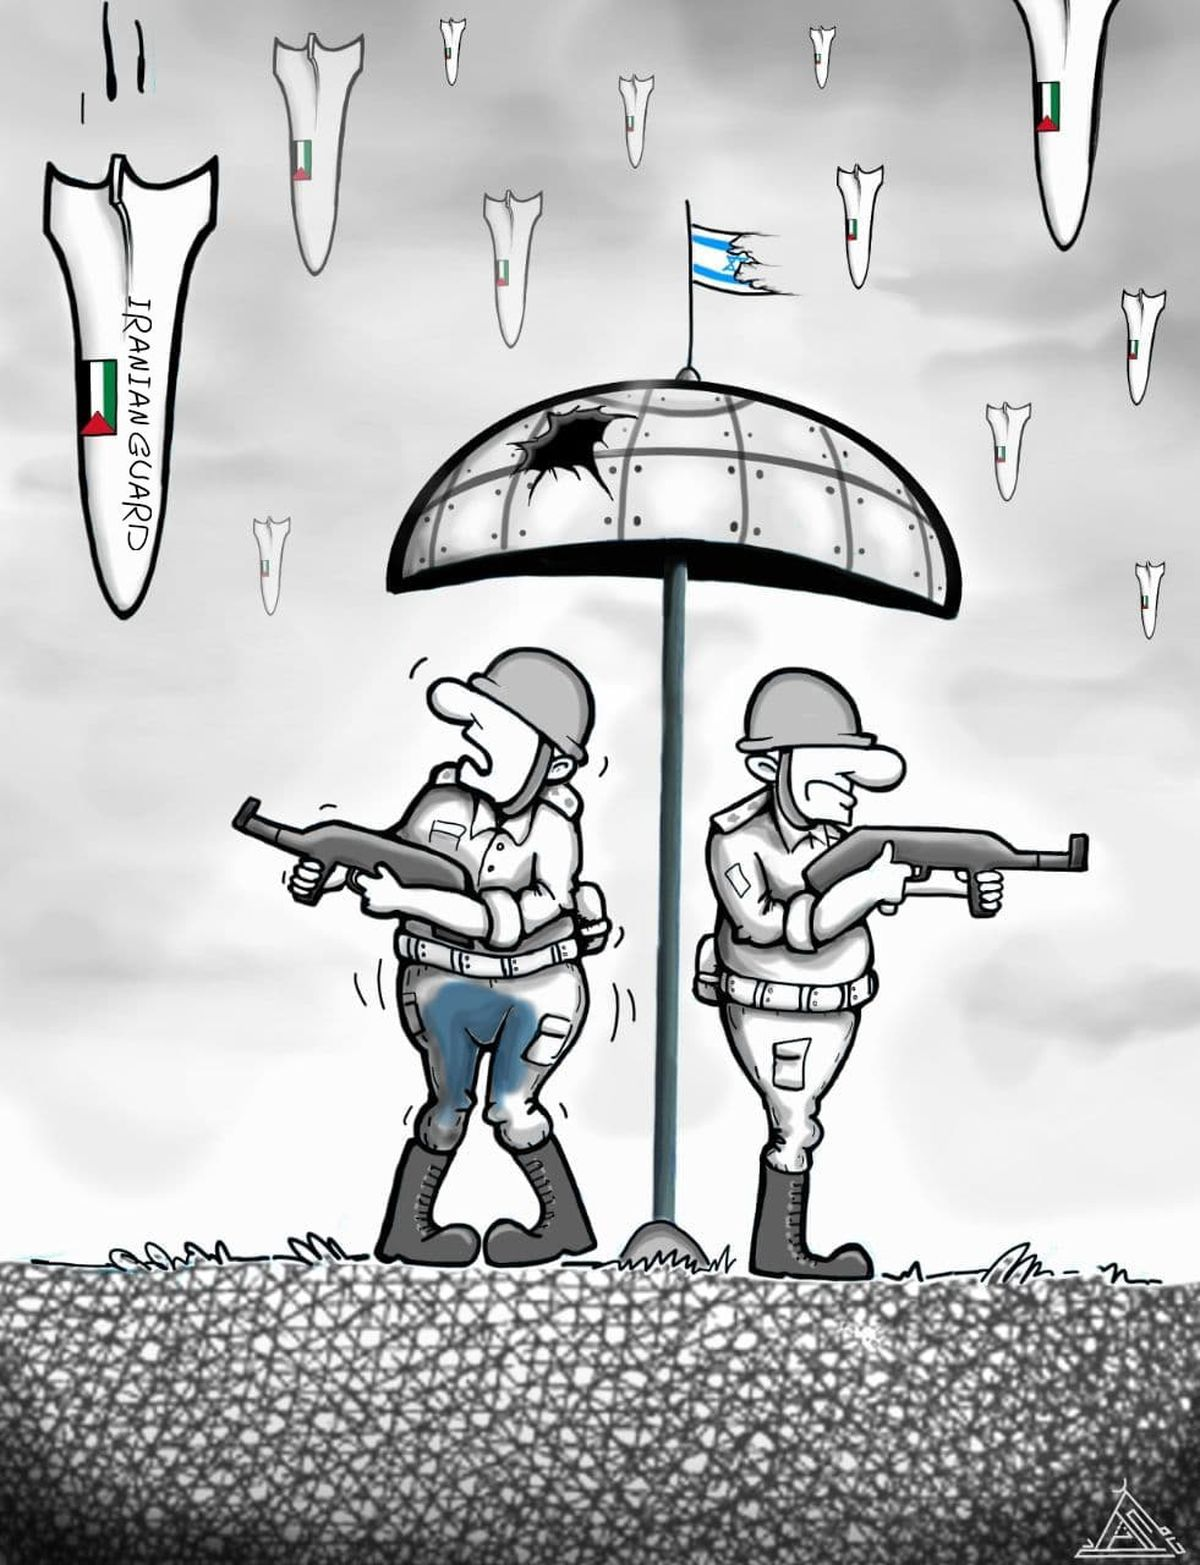 کاریکاتور | گنبد آهنین!